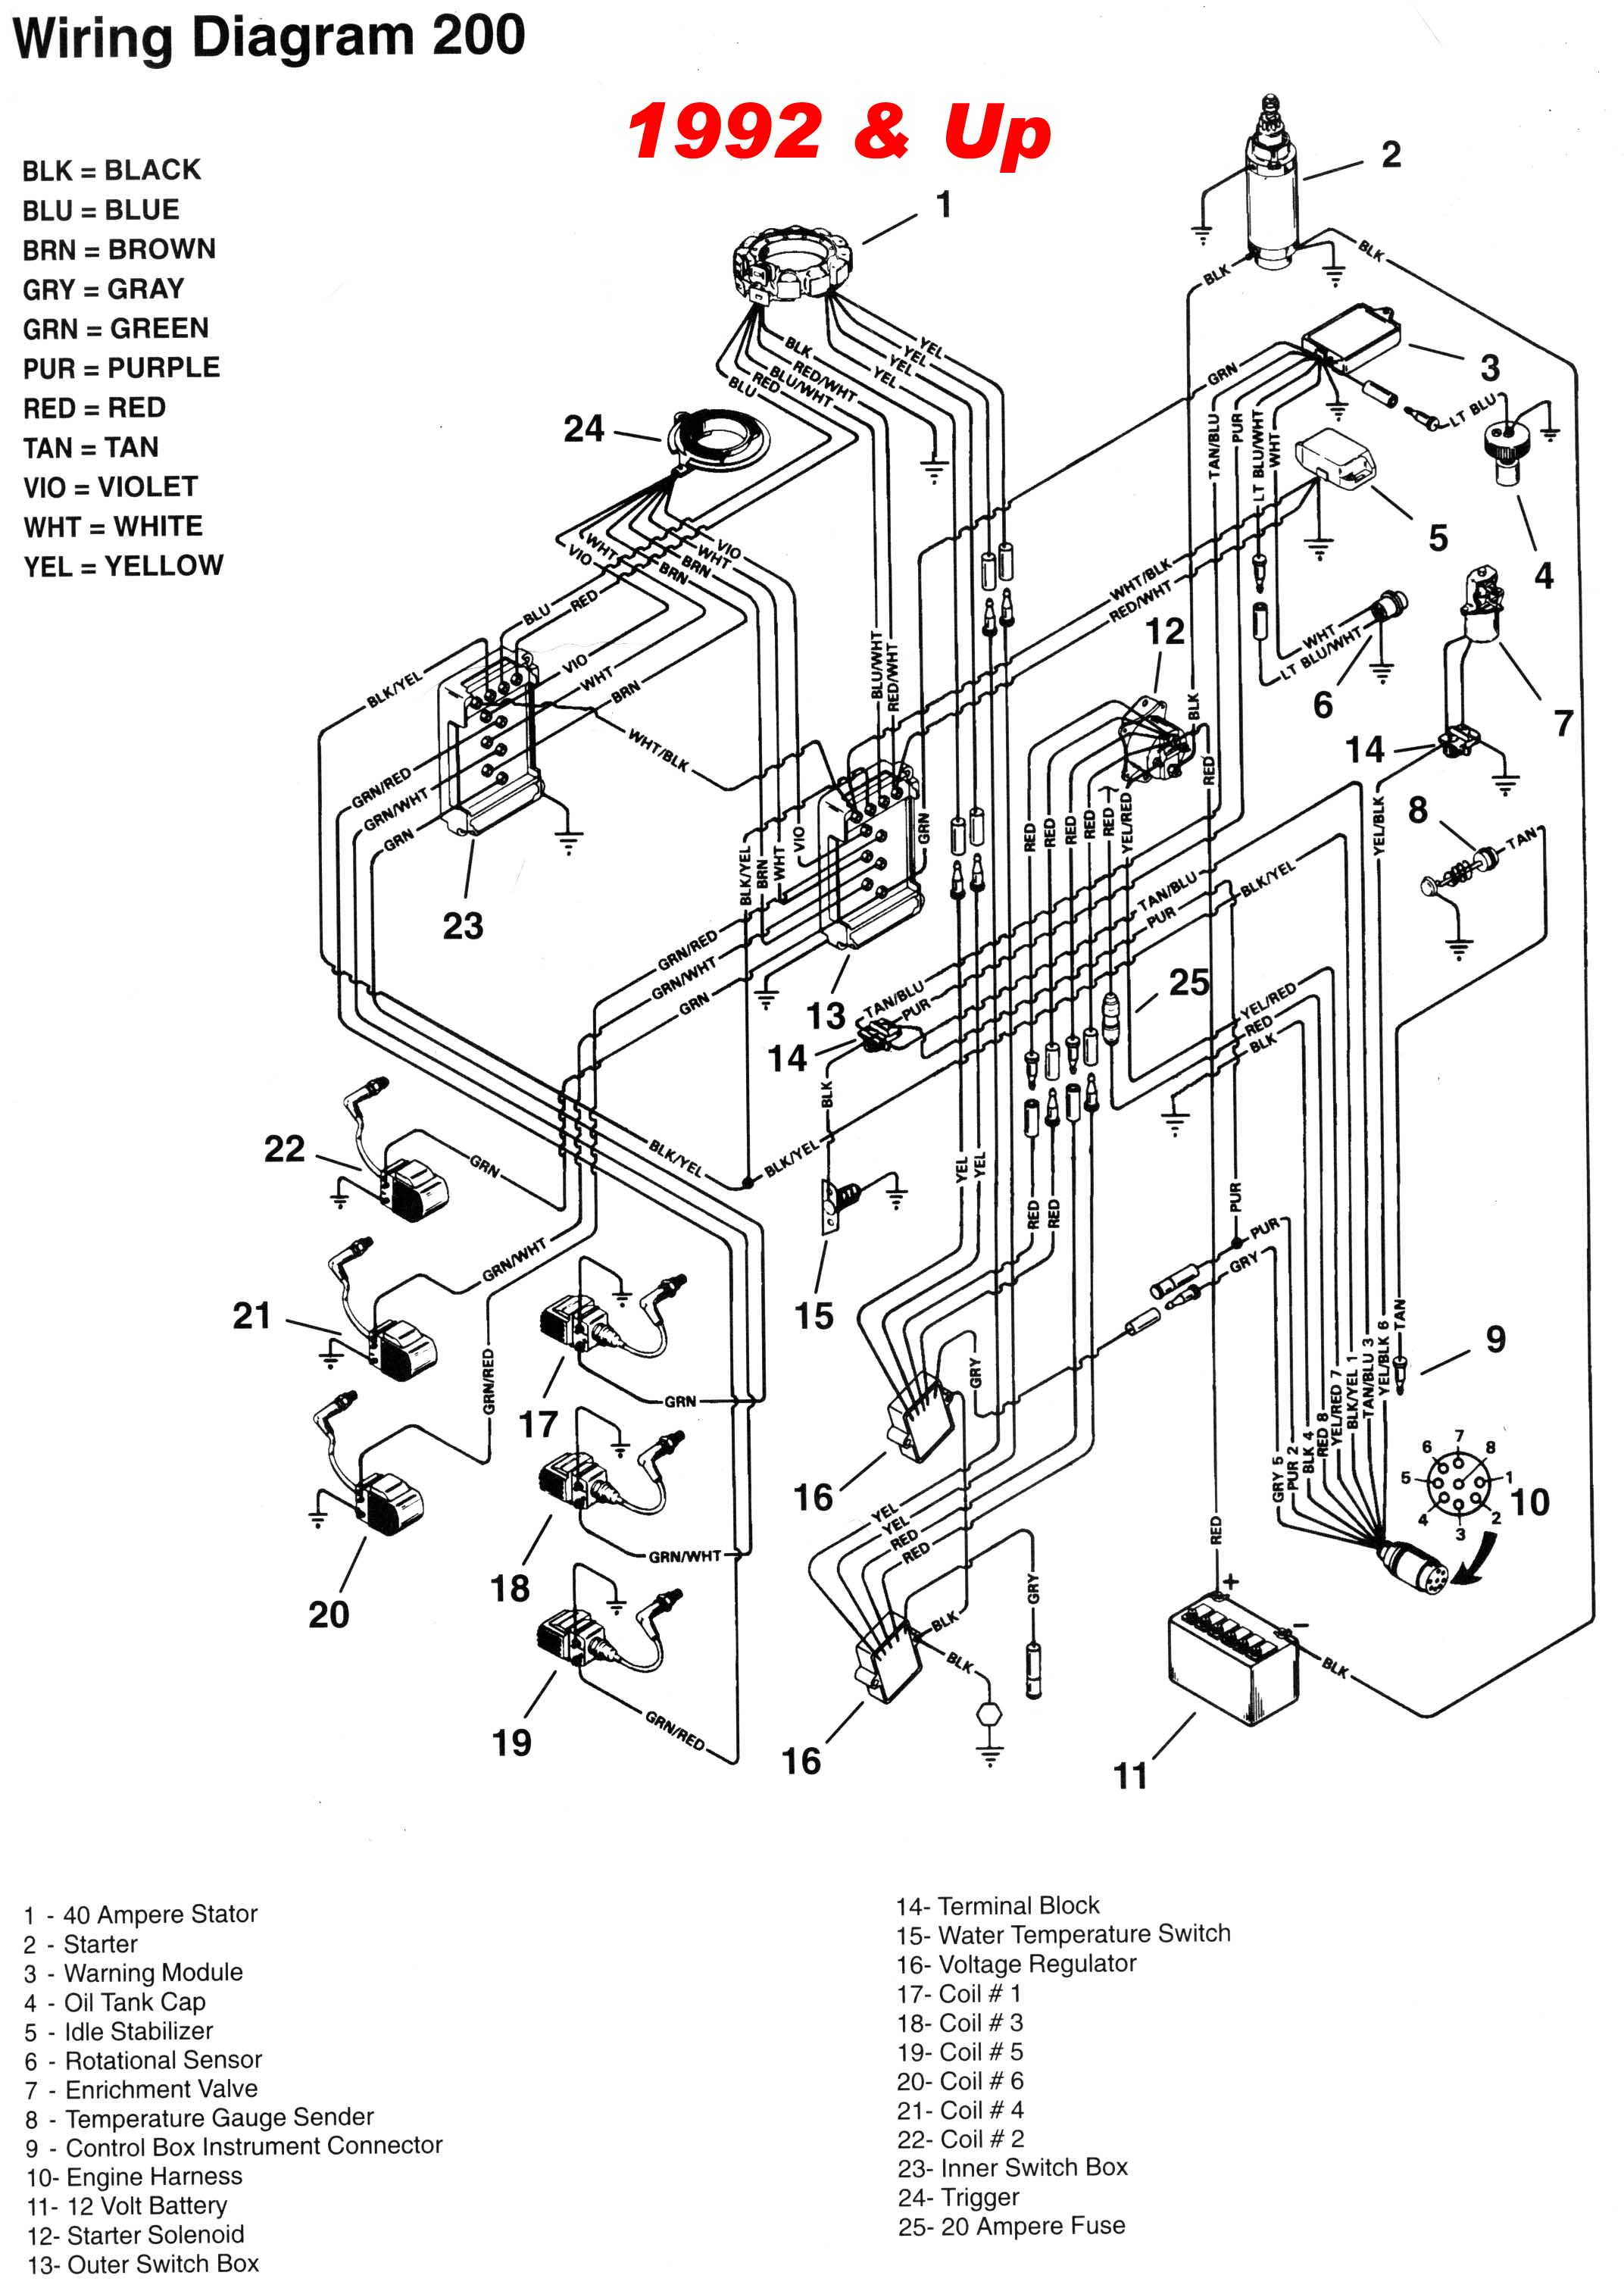 Amusing Suzuki Outboard Control Wiring Diagram Ideas - Best Image ...